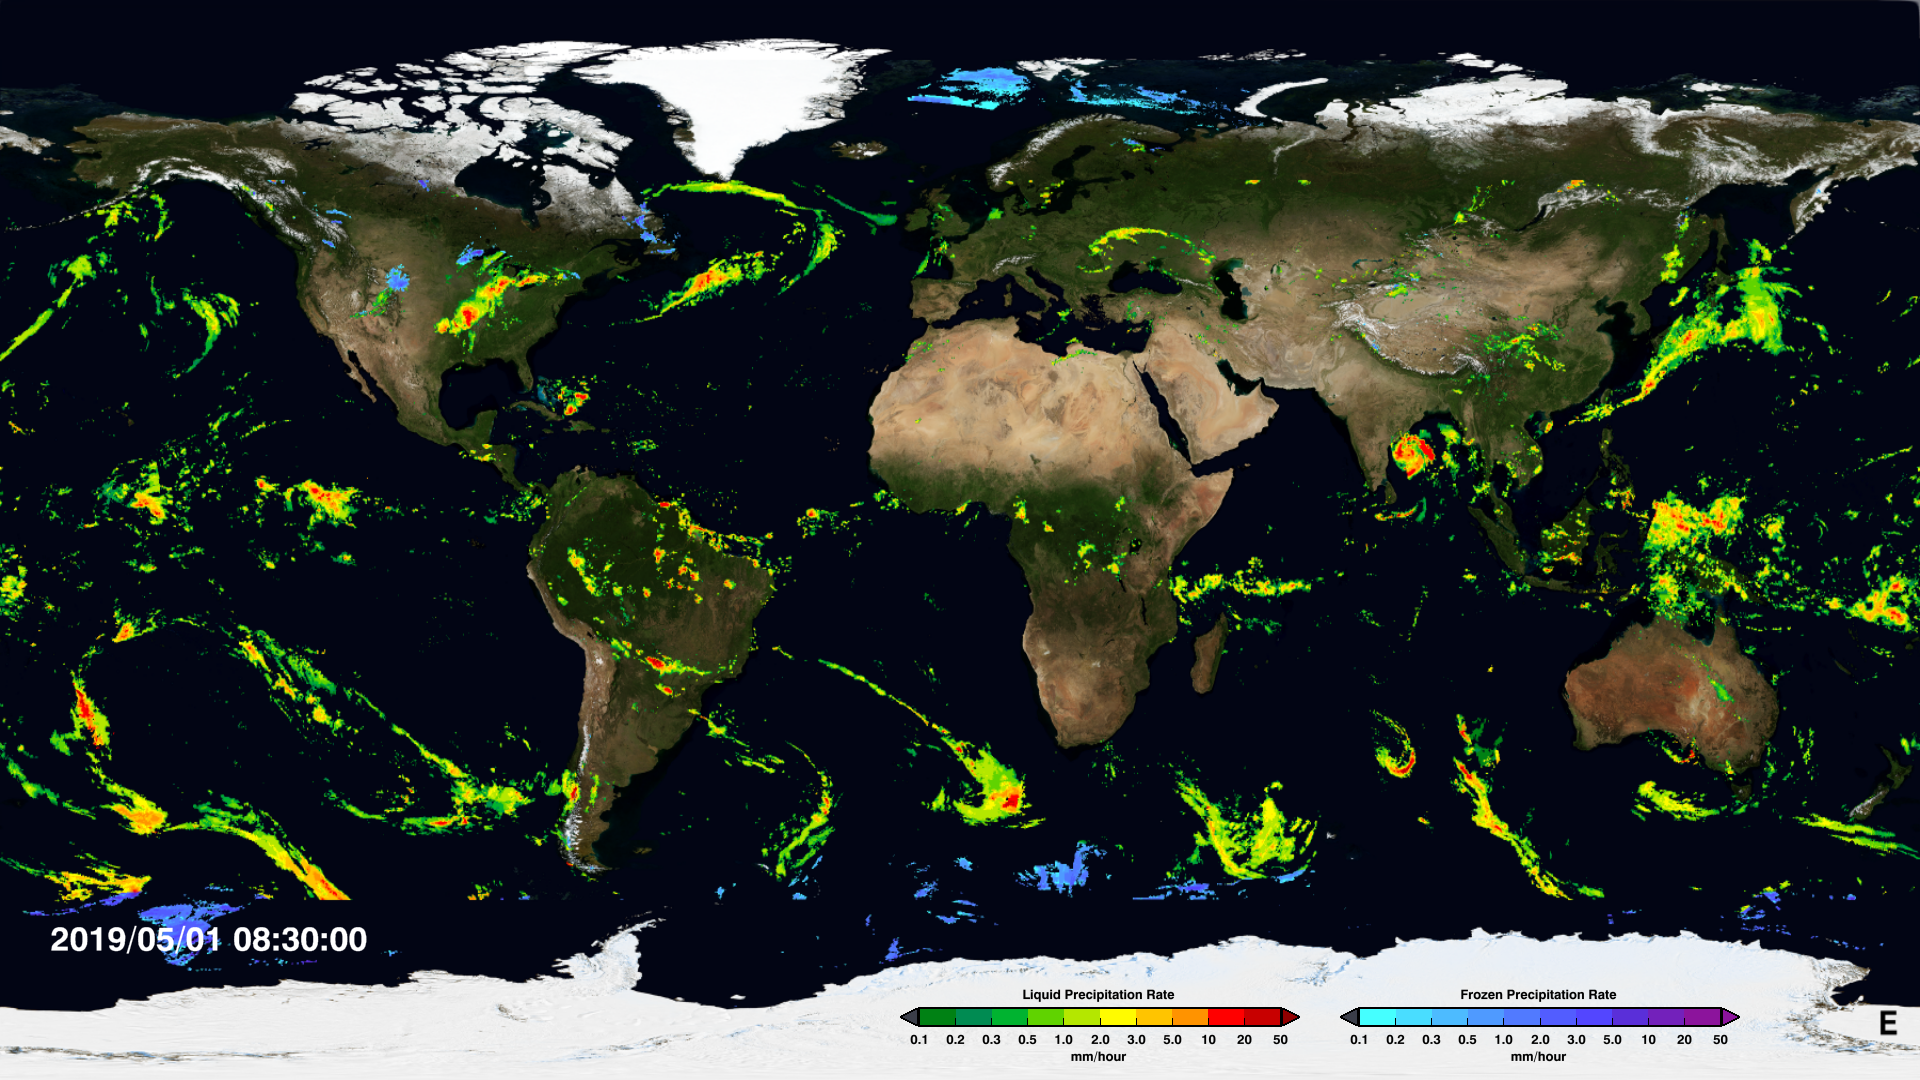 Image of IMERG precipitation data